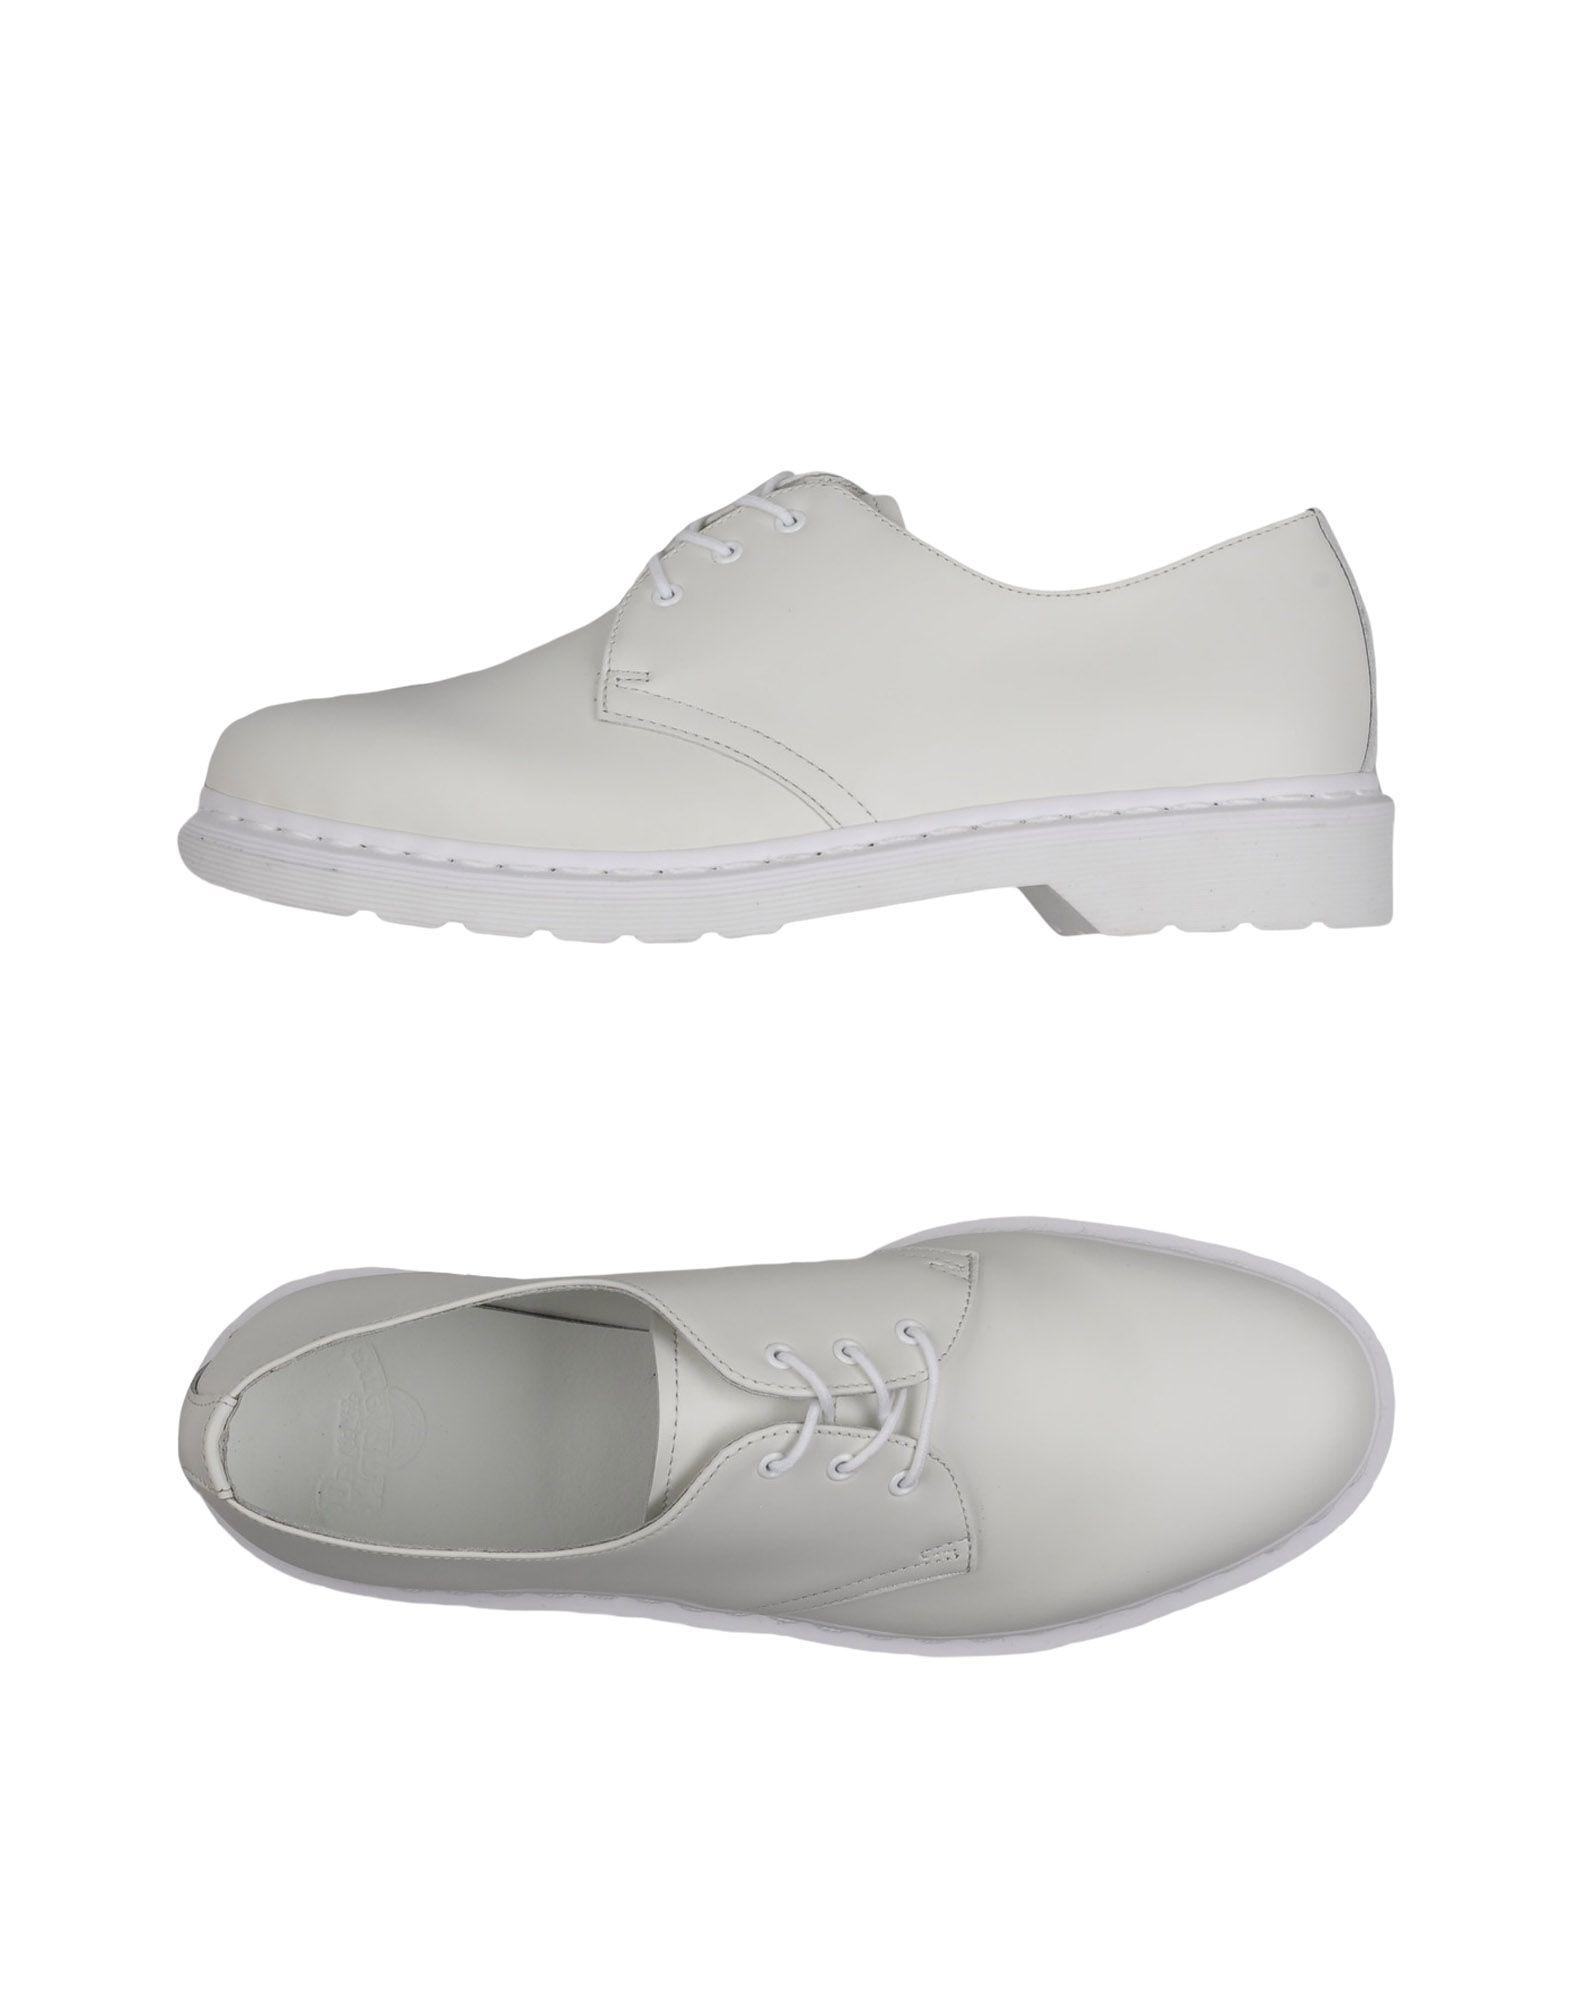 Rabatt echte Schuhe Dr. Martens Schnürschuhe Herren  11362668CU